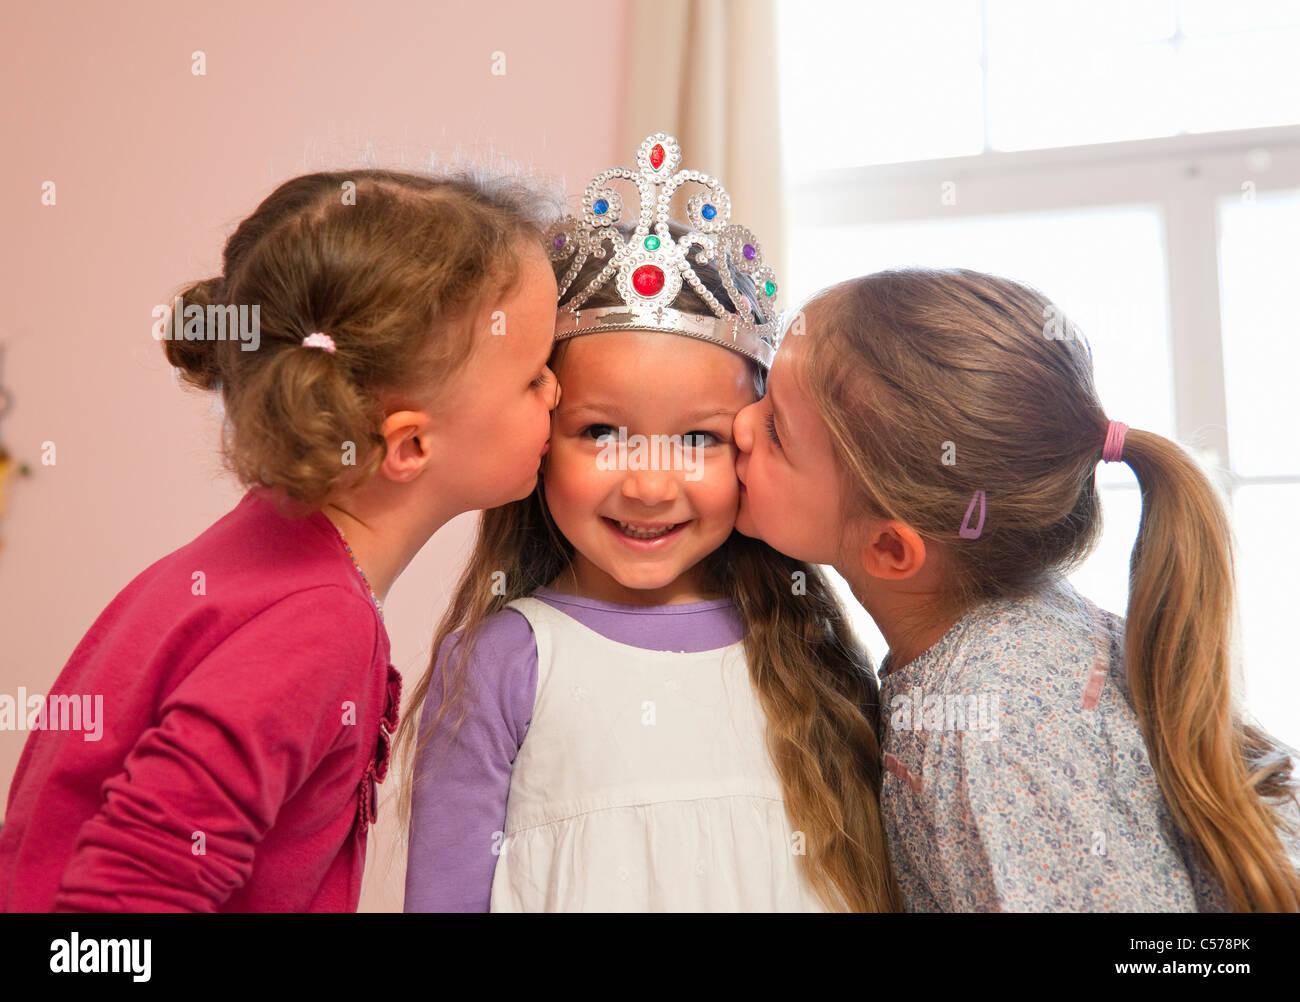 Girls kissing friend's cheeks Stock Photo